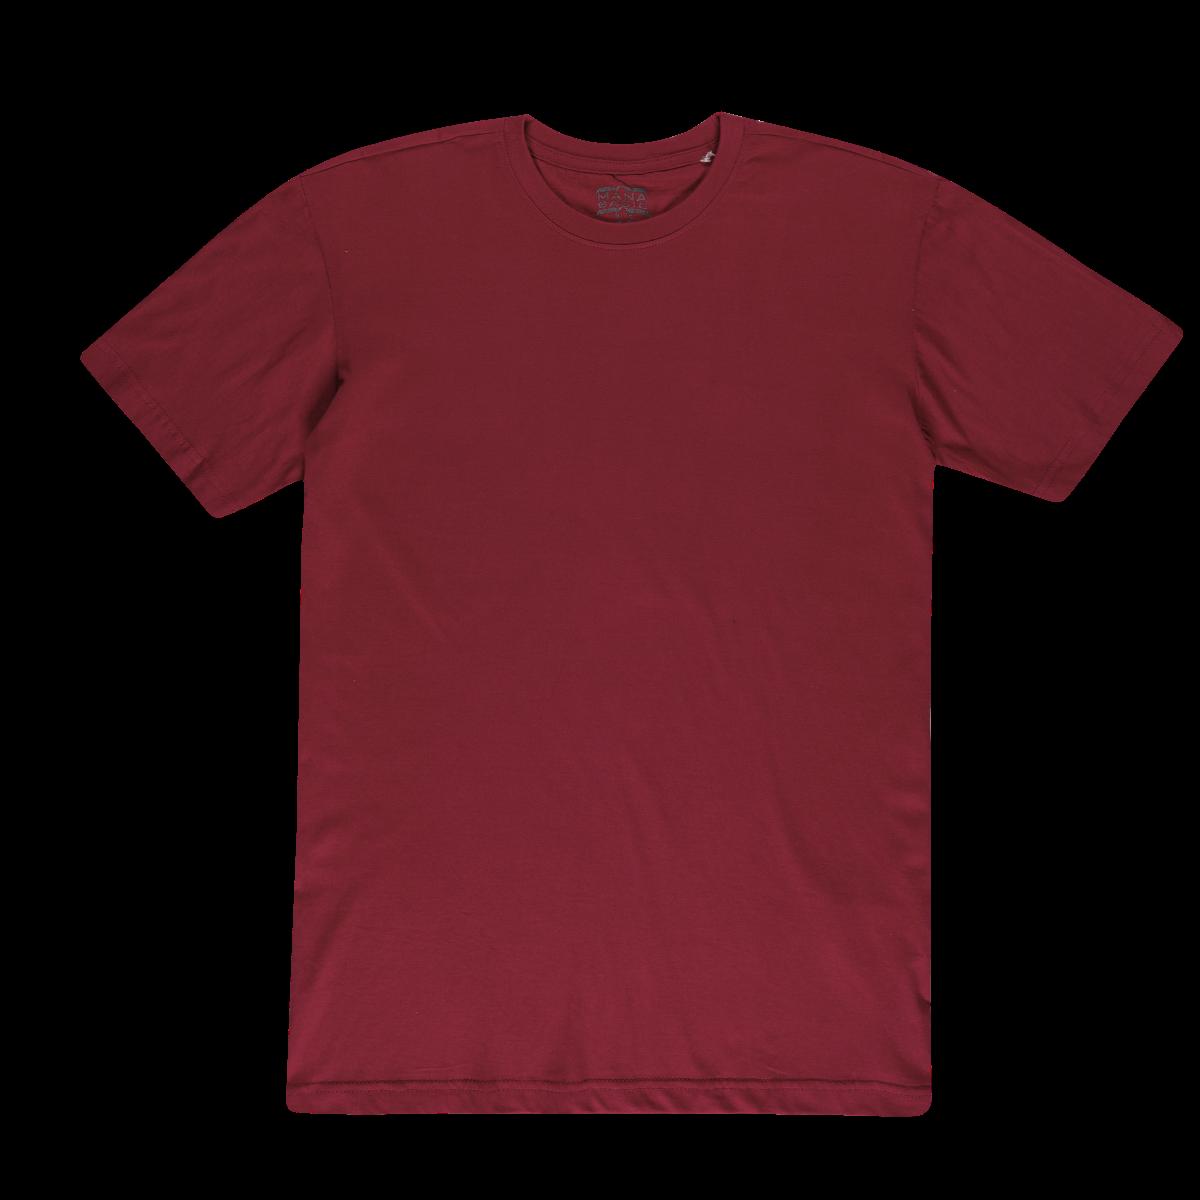 Moška majica, temno rdeča